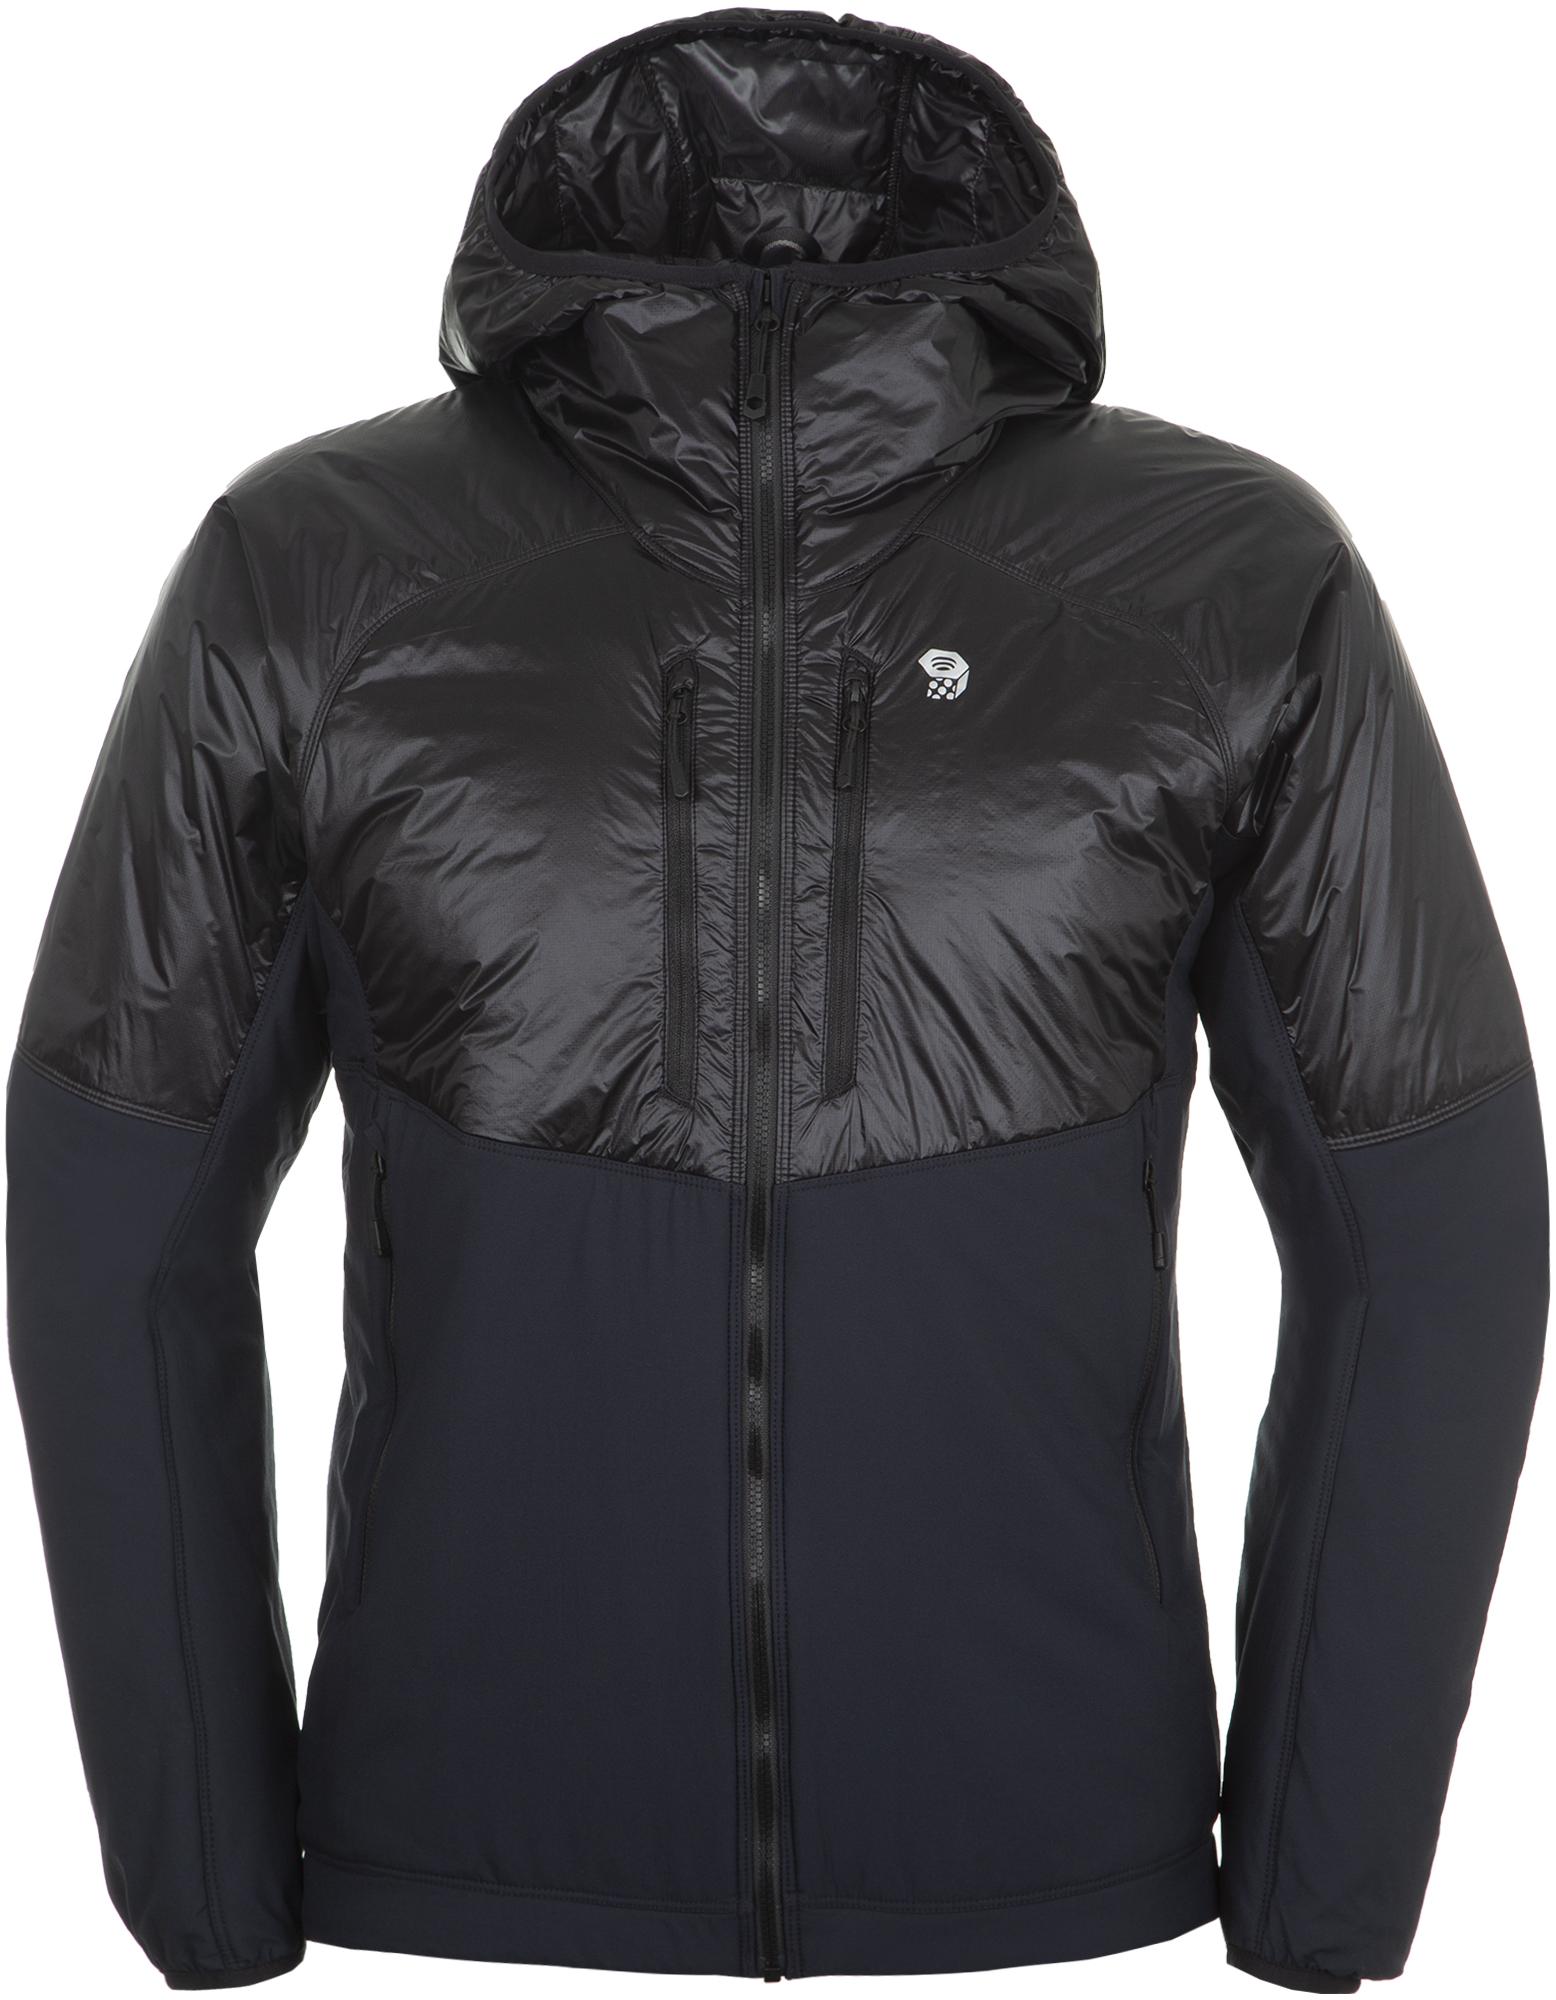 Mountain Hardwear Куртка утепленная мужская Mountain Hardwear Kor Strata, размер 54